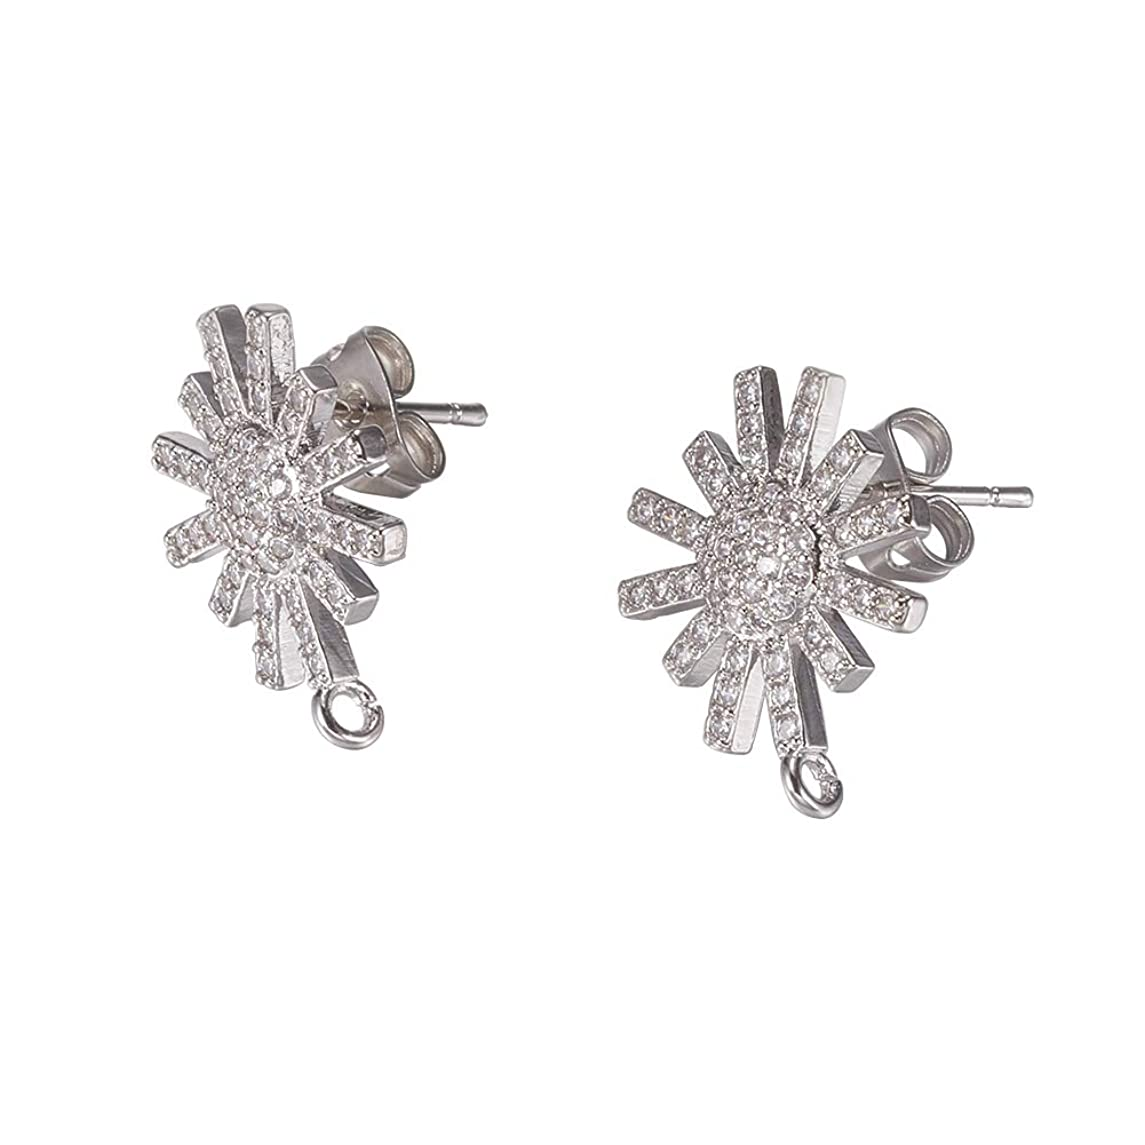 PH PandaHall 10 PCS(5 Pairs) Brass Cubic Zirconia Ear Stud, Flower Rhinestone Setting Earring Back Posts, Platinum